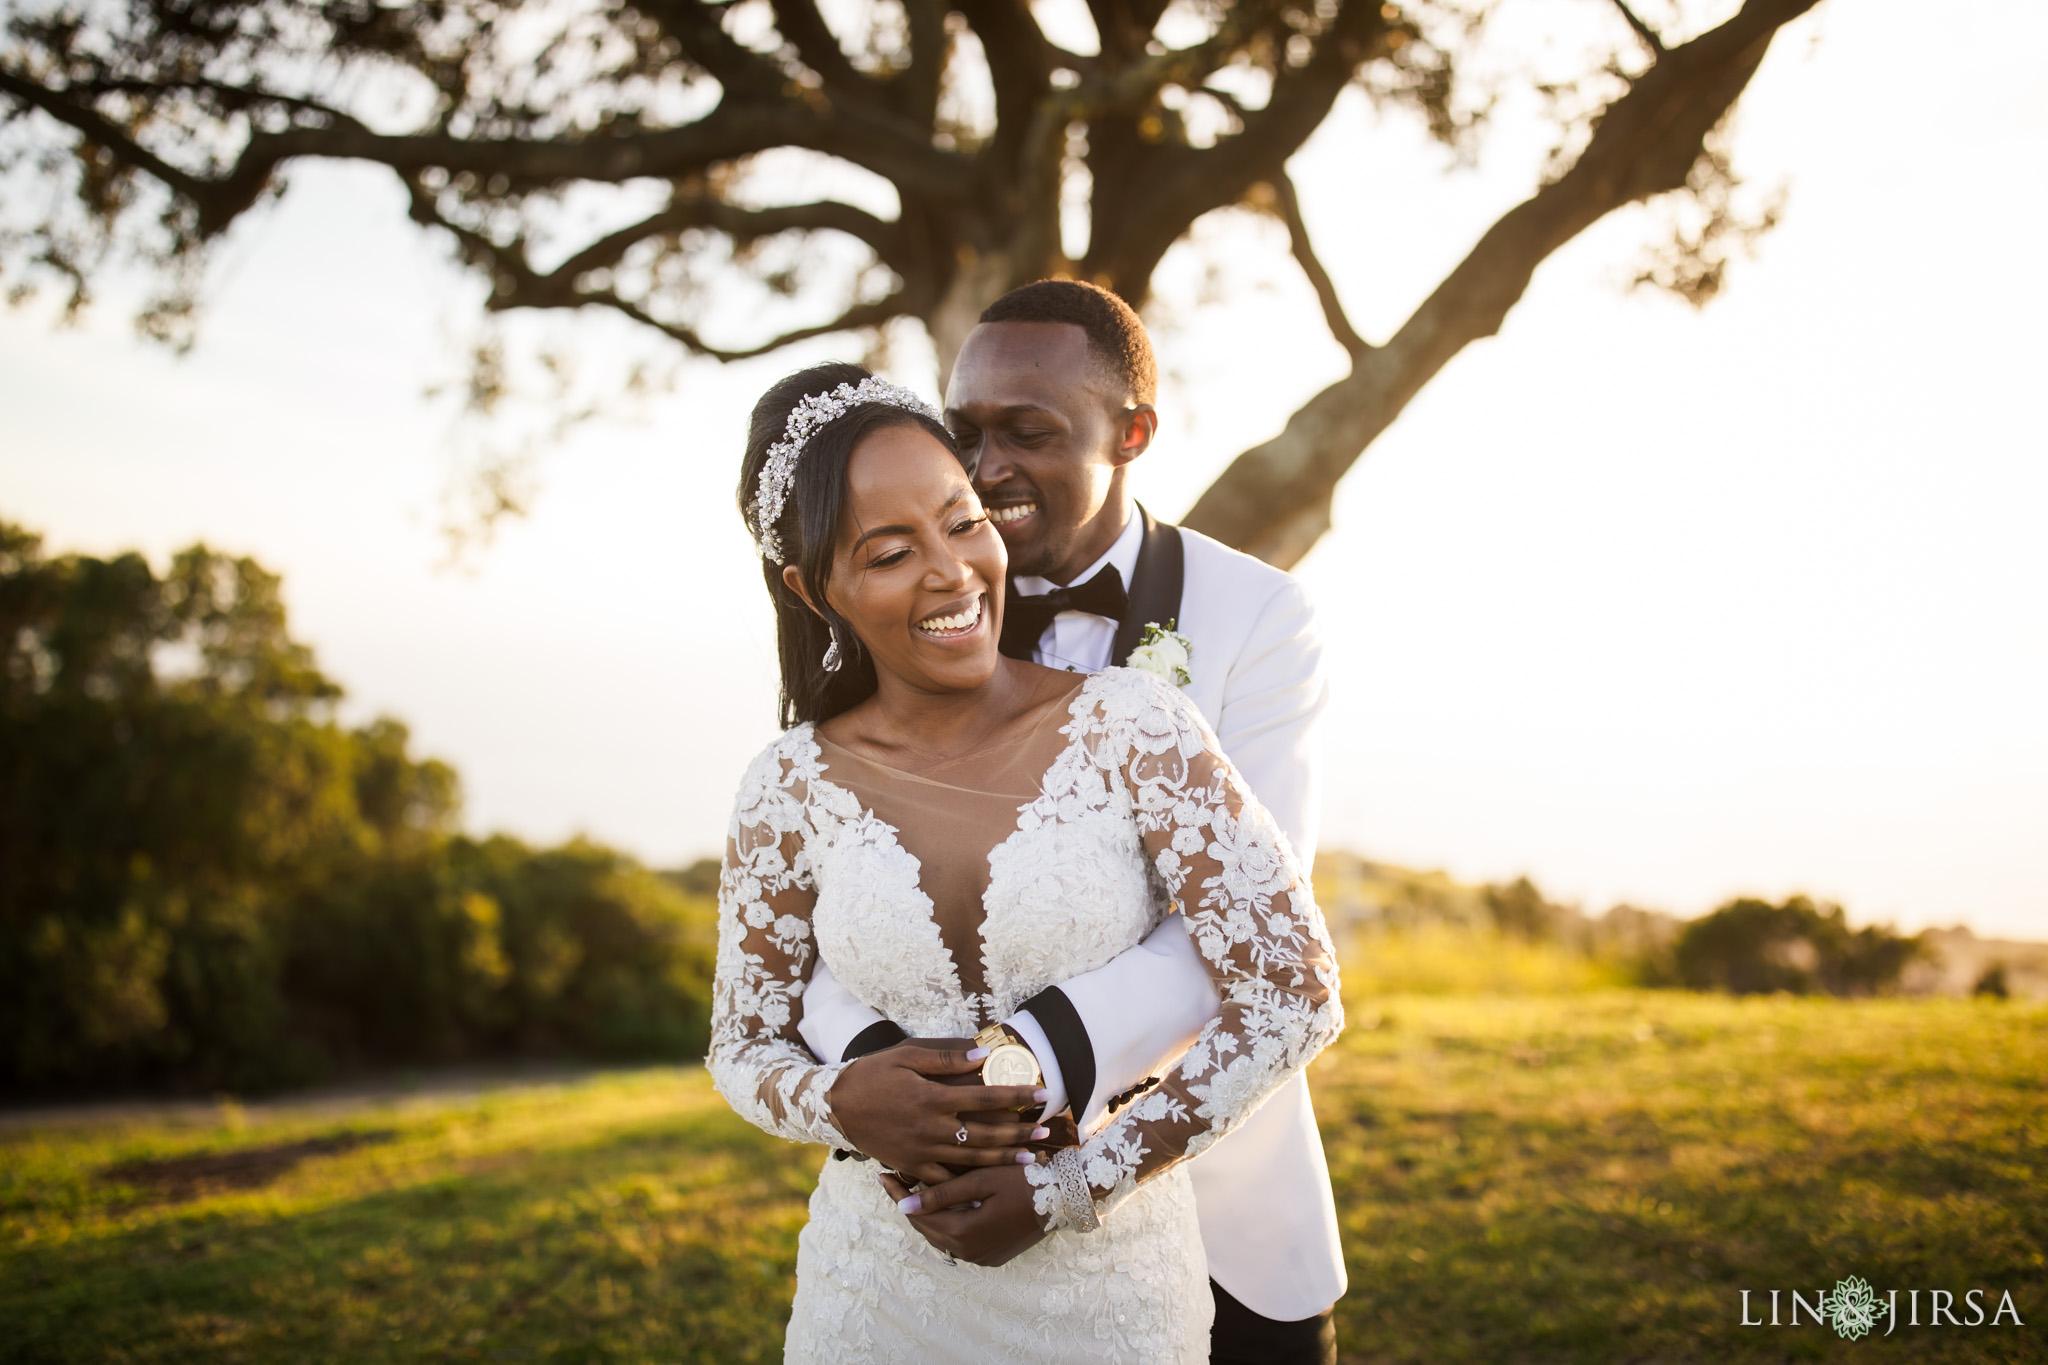 15 Los Verdes Golf Course Palos Verdes Kenyan Wedding Photography